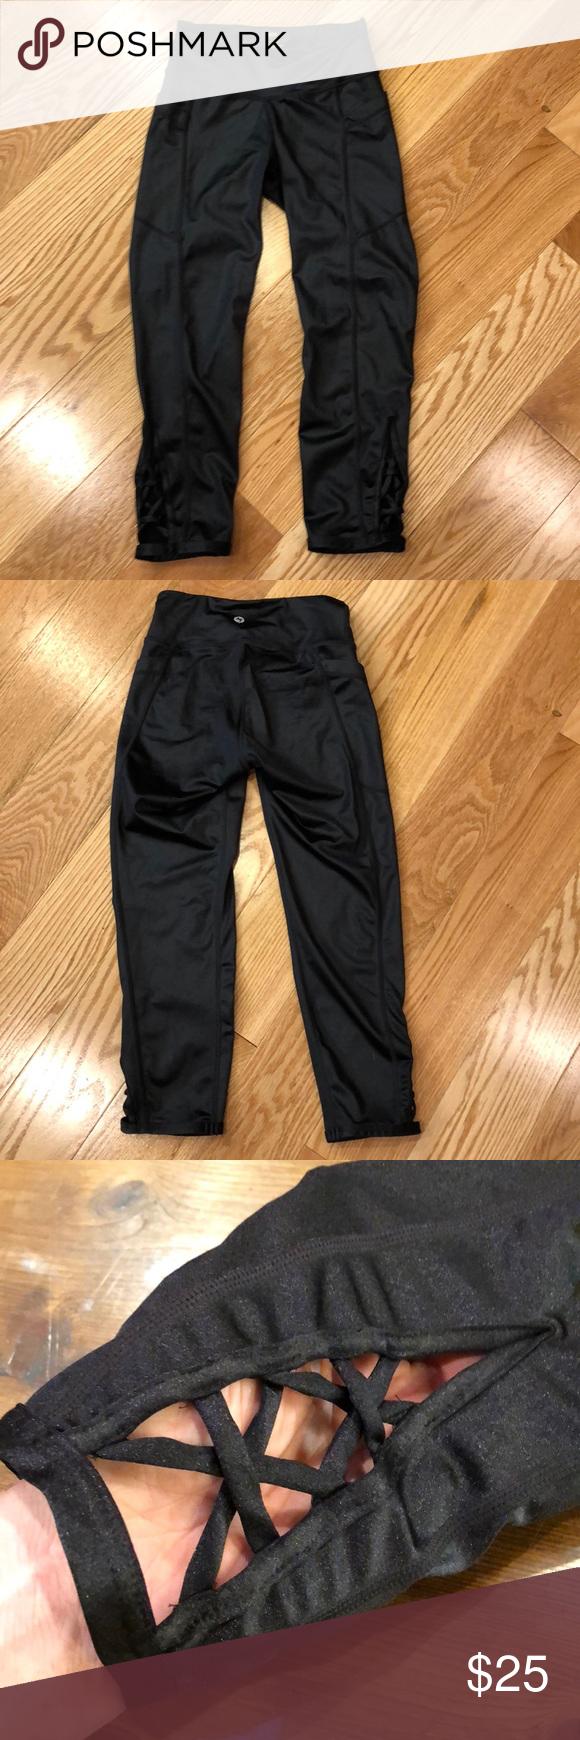 9c763cdf56305d Popflex wishing star active Capri ( shiny) In like new condition shiny  black nylon Capri active pants with open crisscross work at bottom of leg.  popflex ...